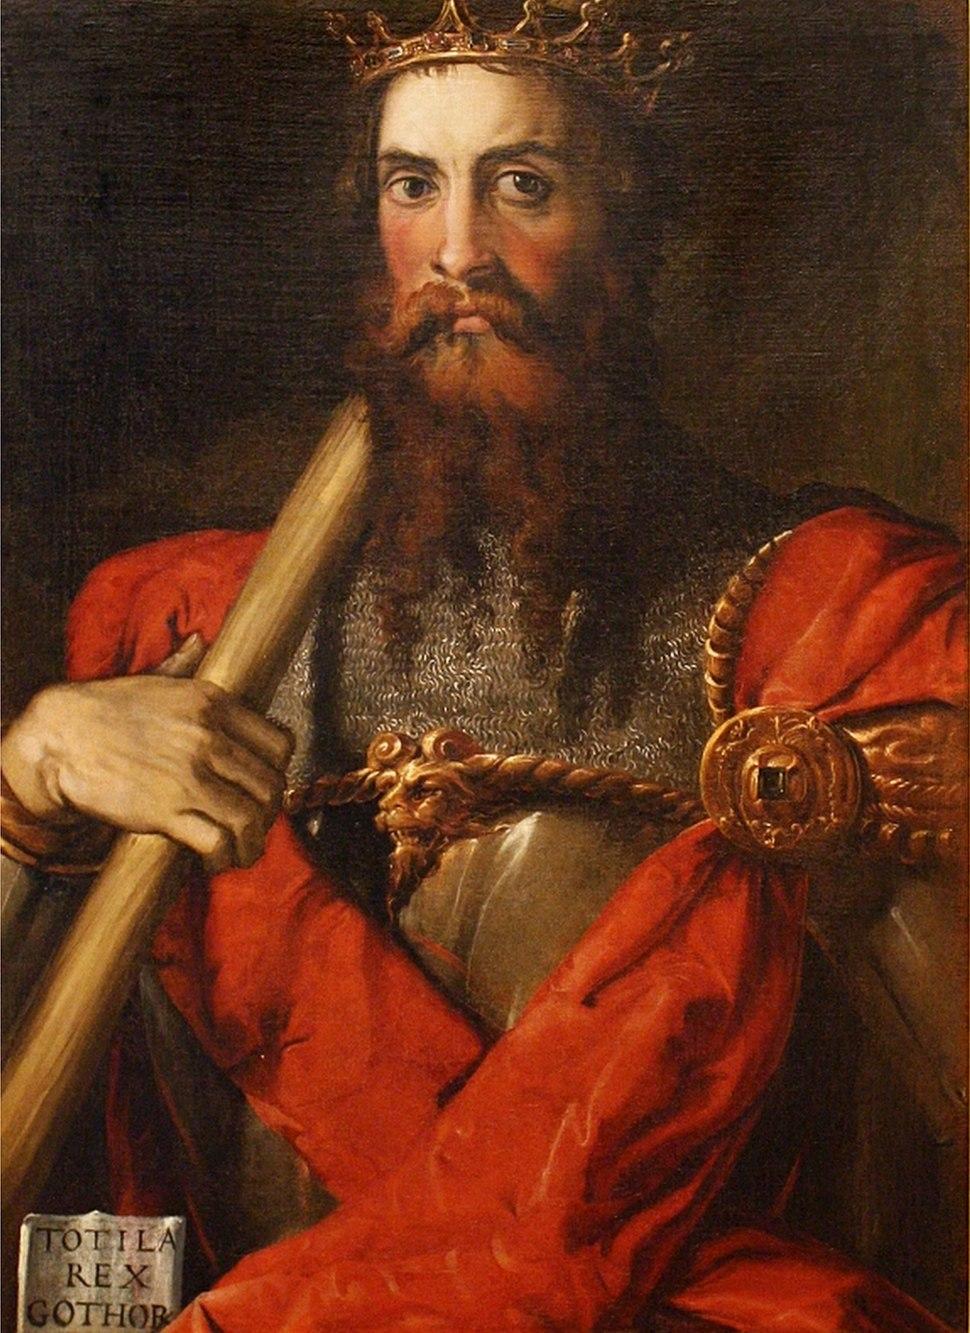 Francesco Salviati - Portrait of Totila, c. 1549